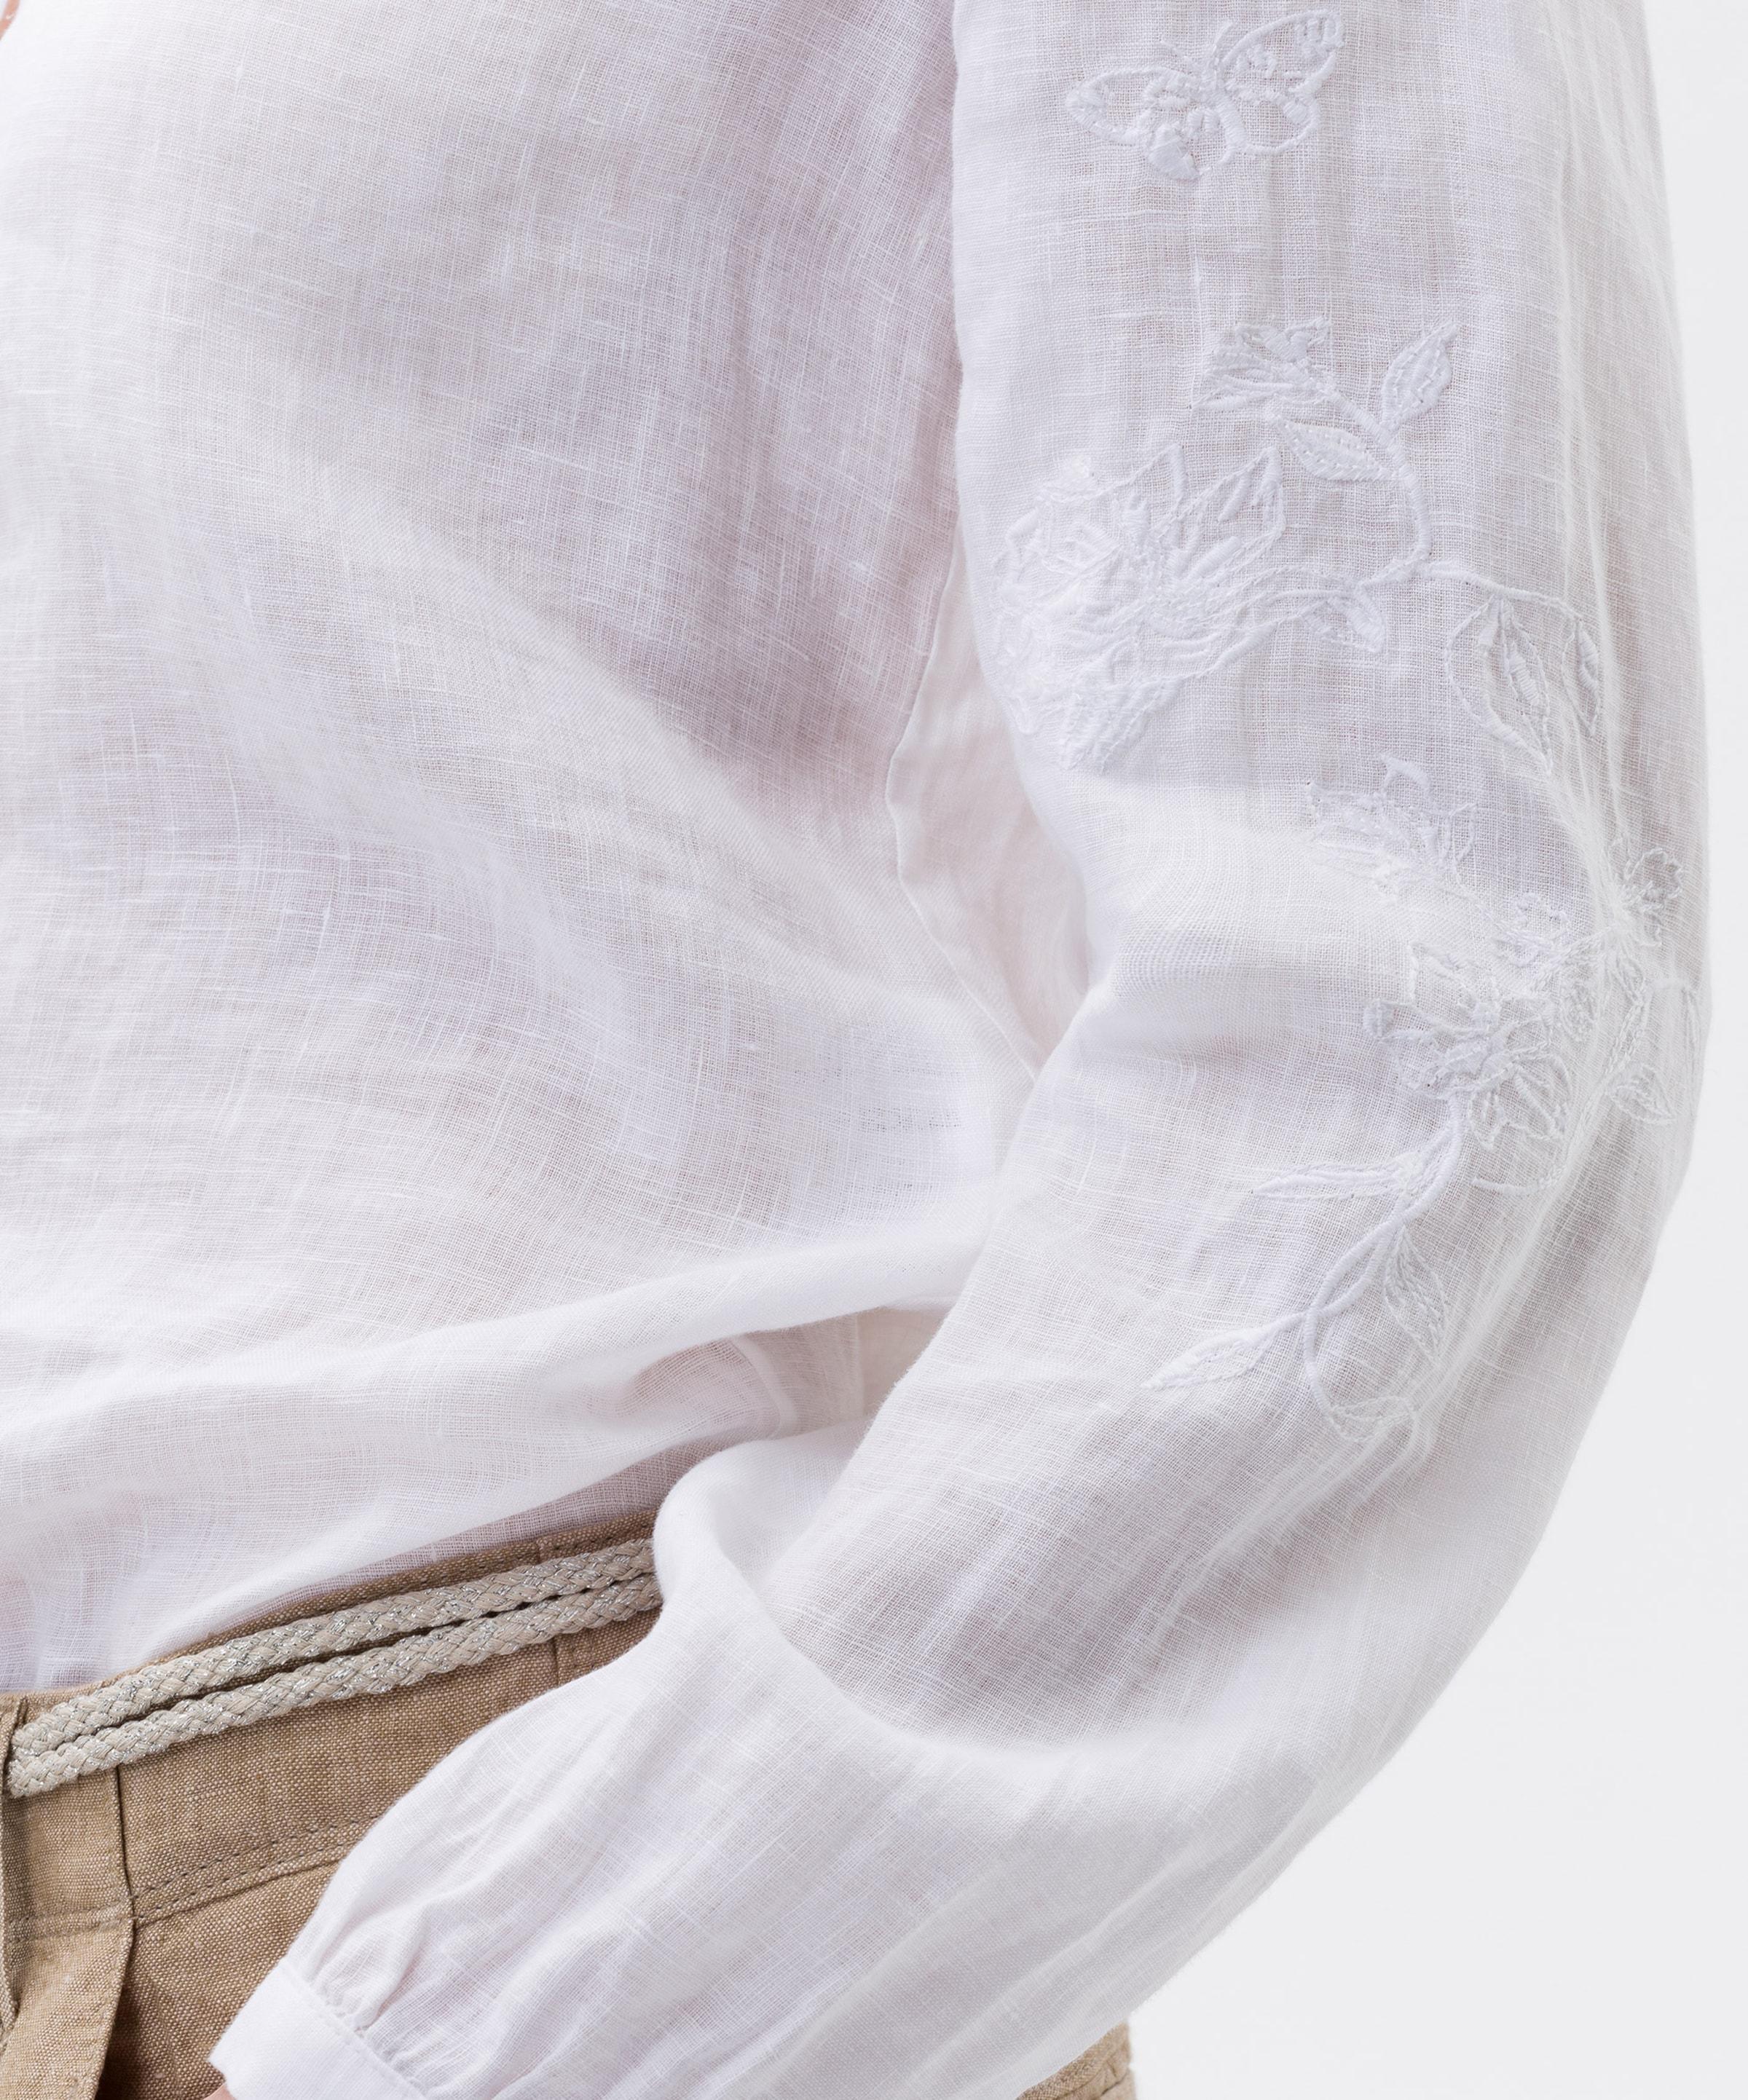 Brax Brax Bluse 'val' Brax Weißmeliert In 'val' Bluse Weißmeliert In Bluse 'val' In n0wOPkX8